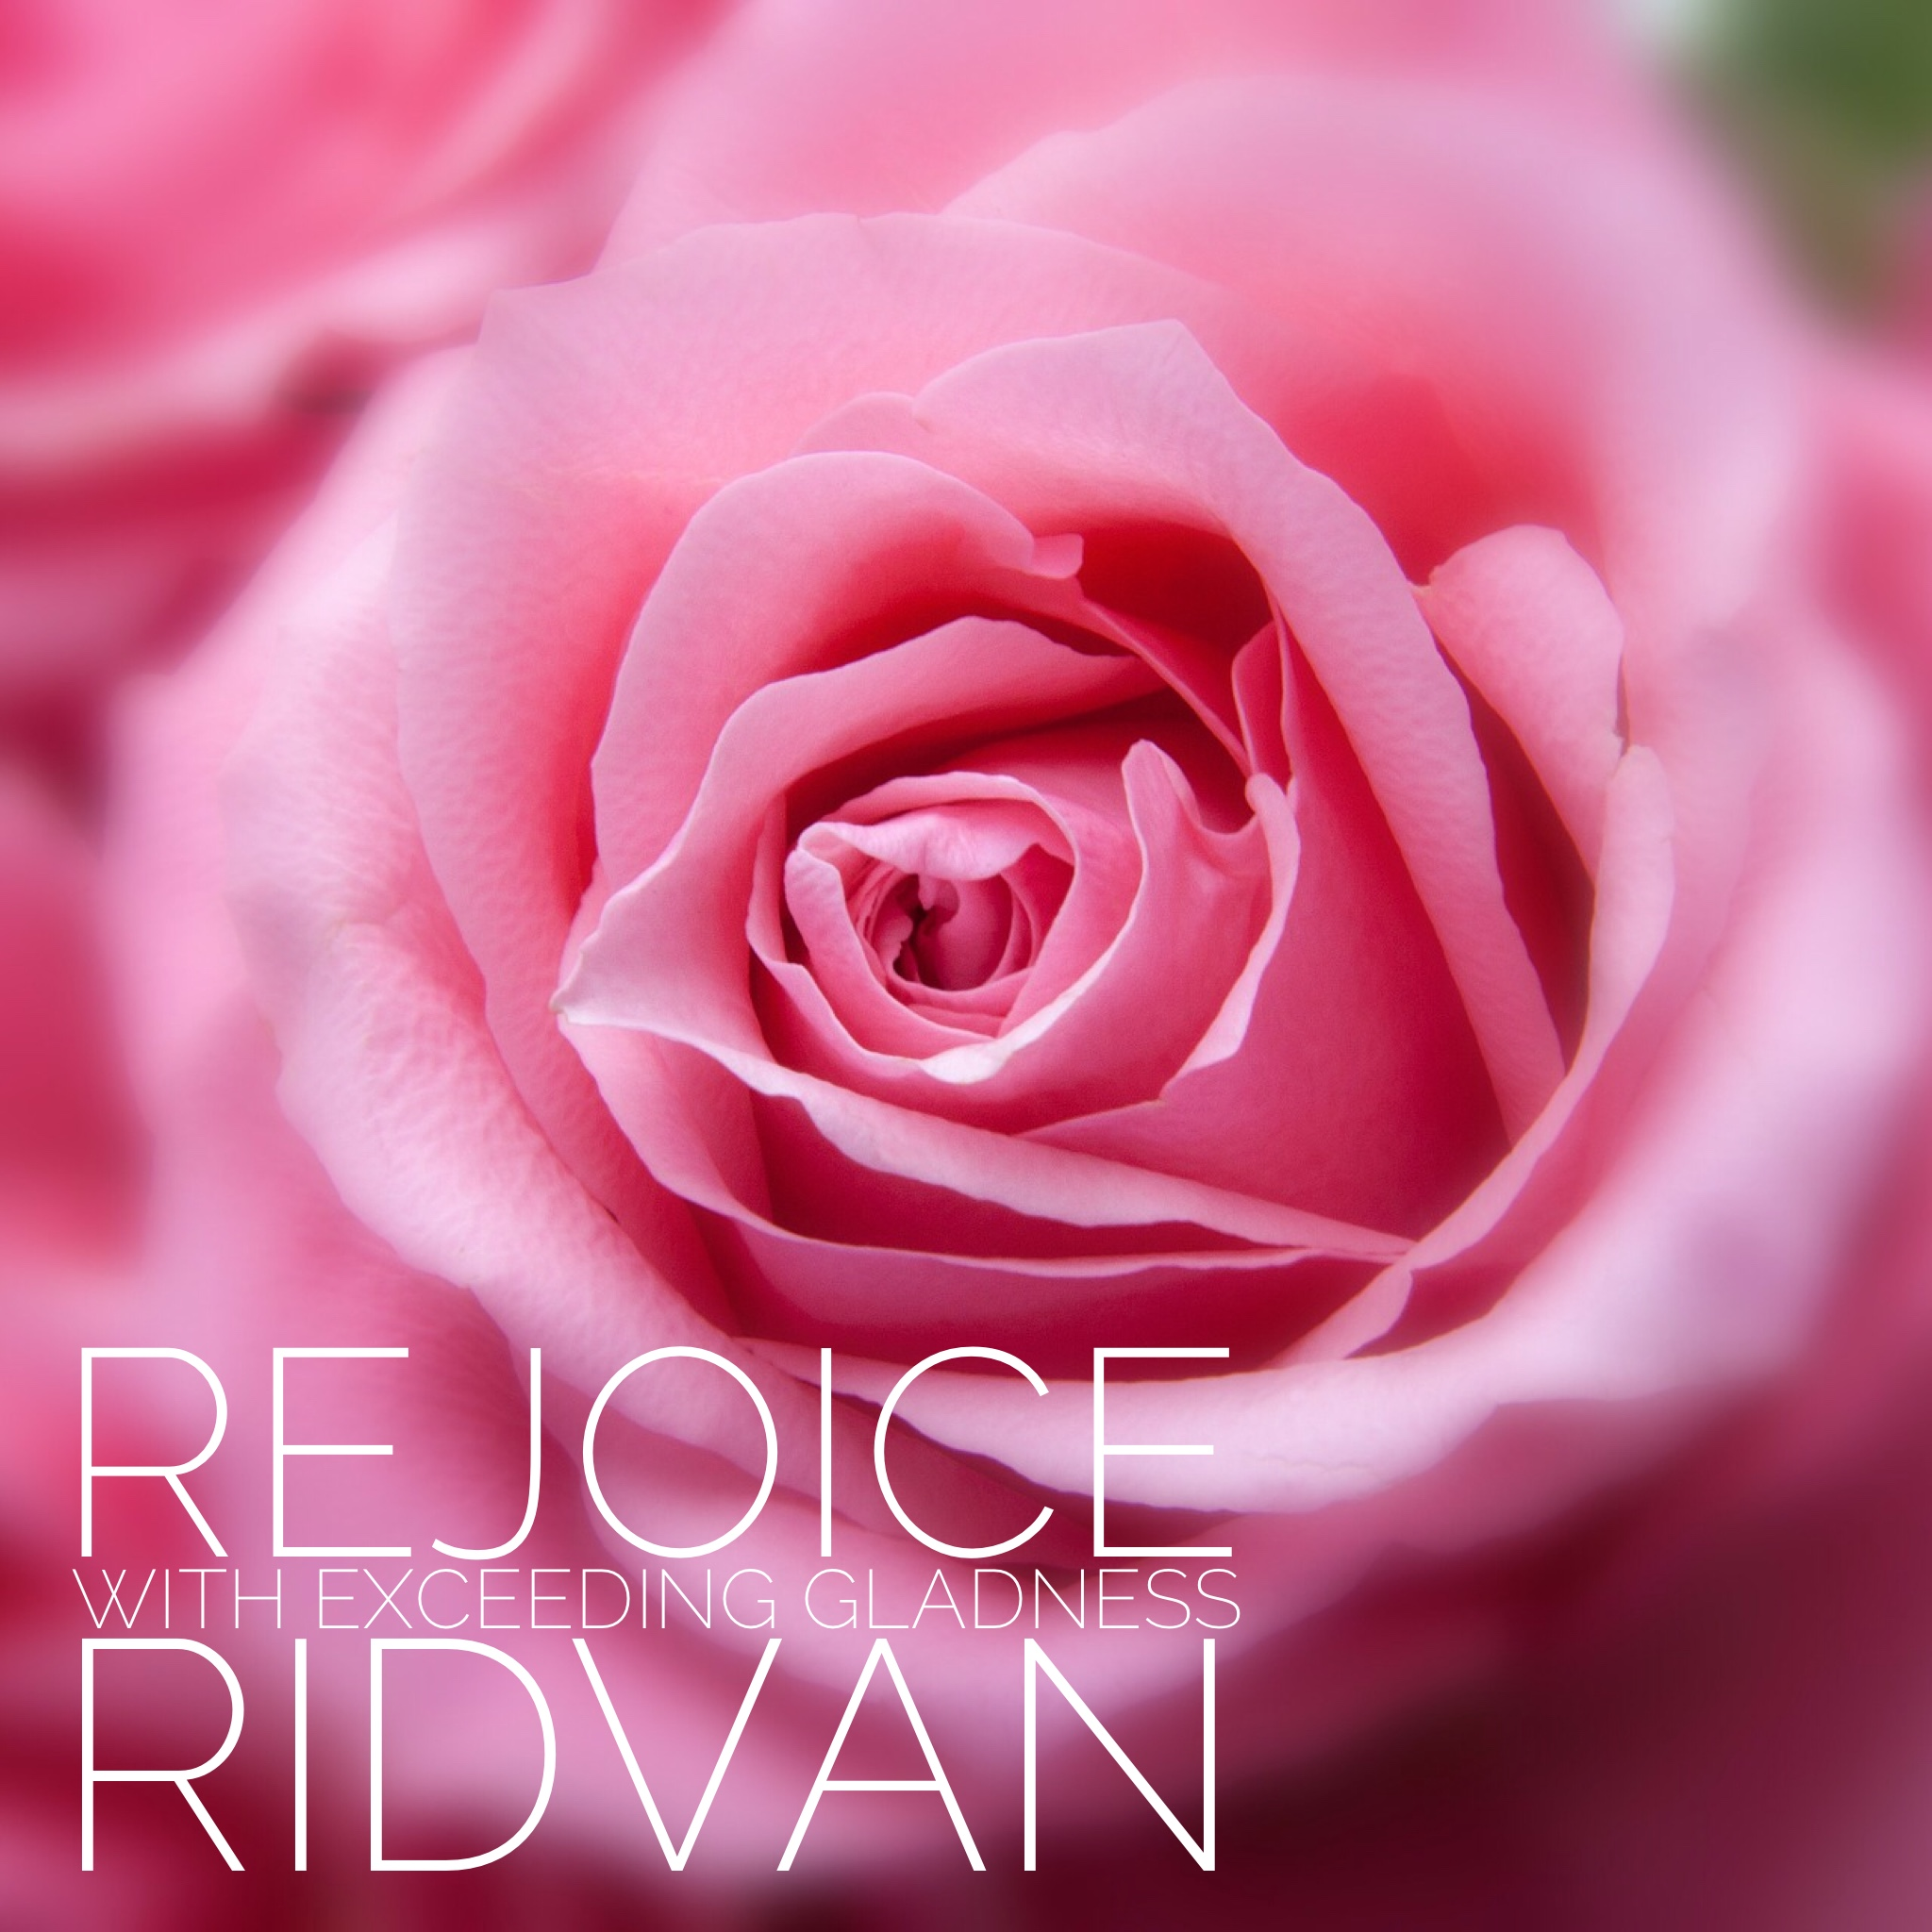 Rejoice with exceeding gladness